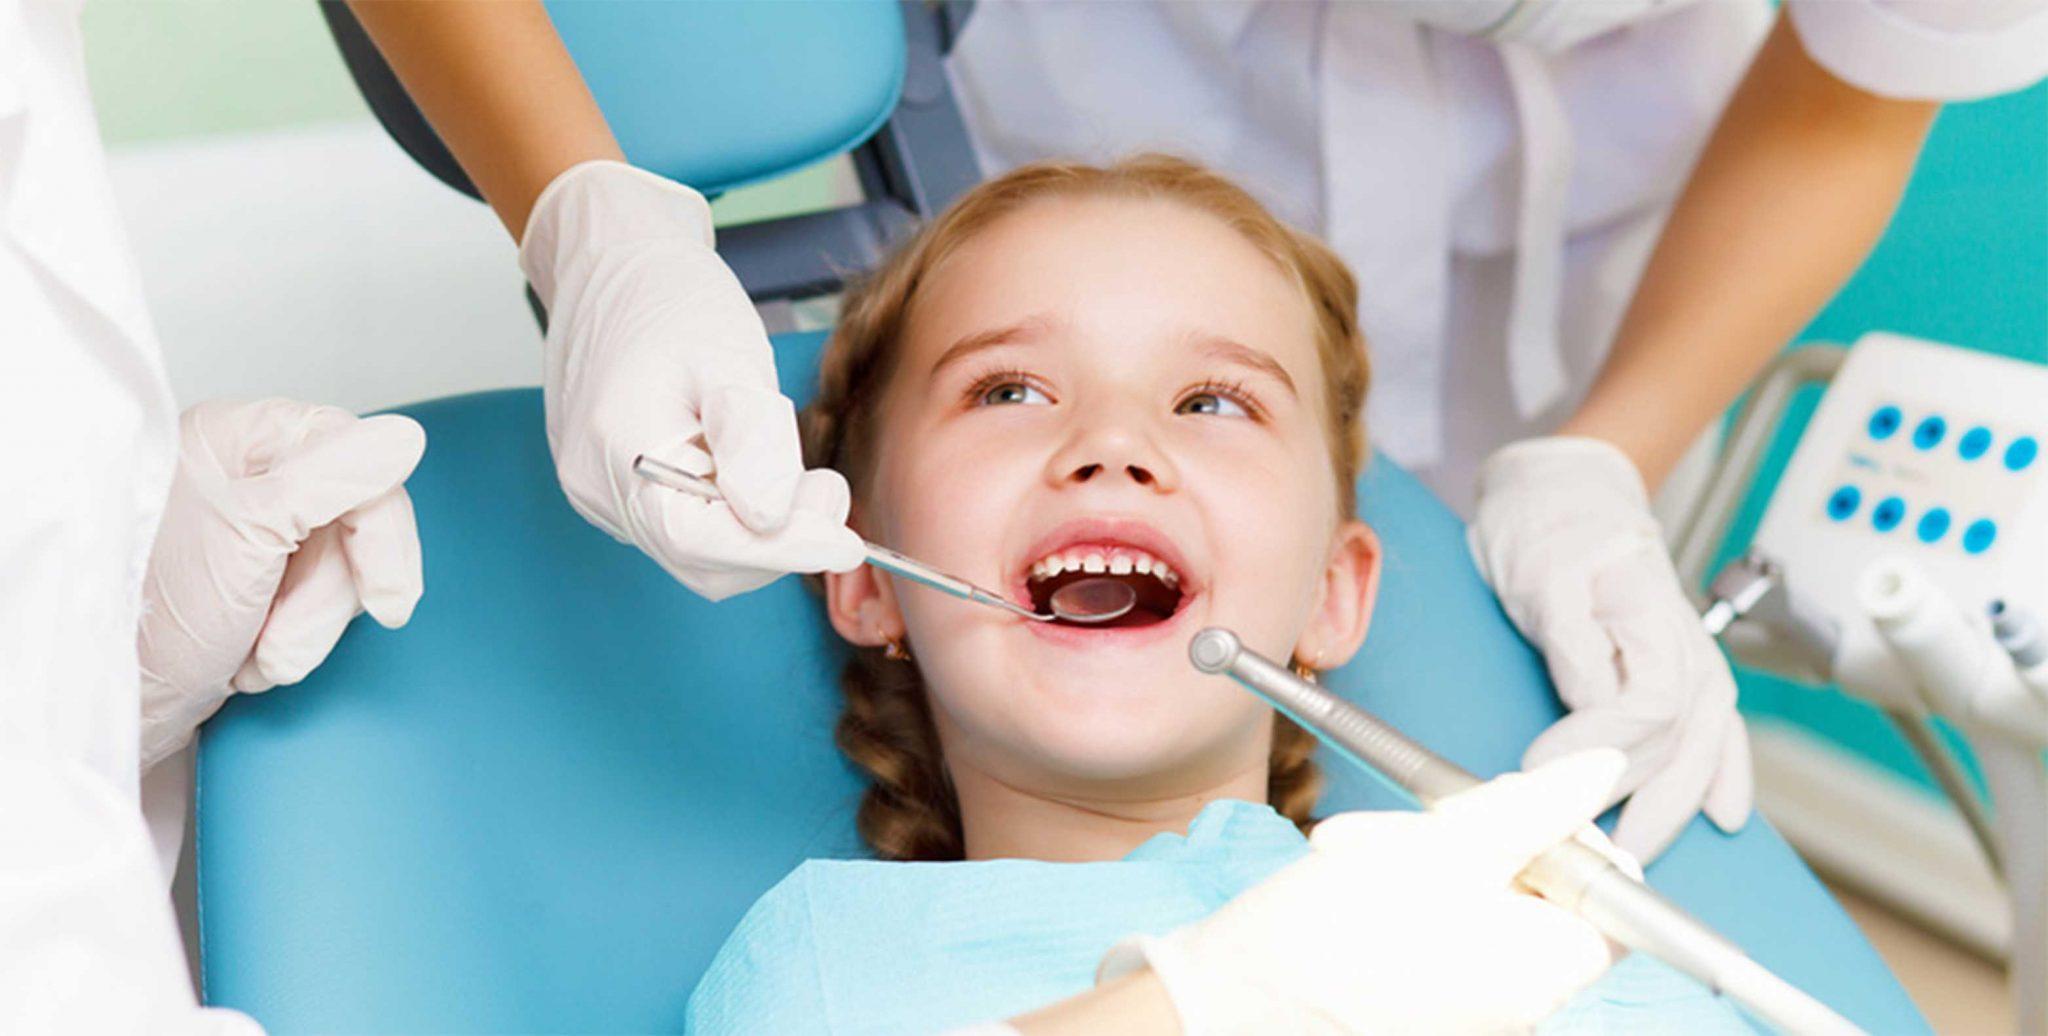 pediatric dental care service bangalore